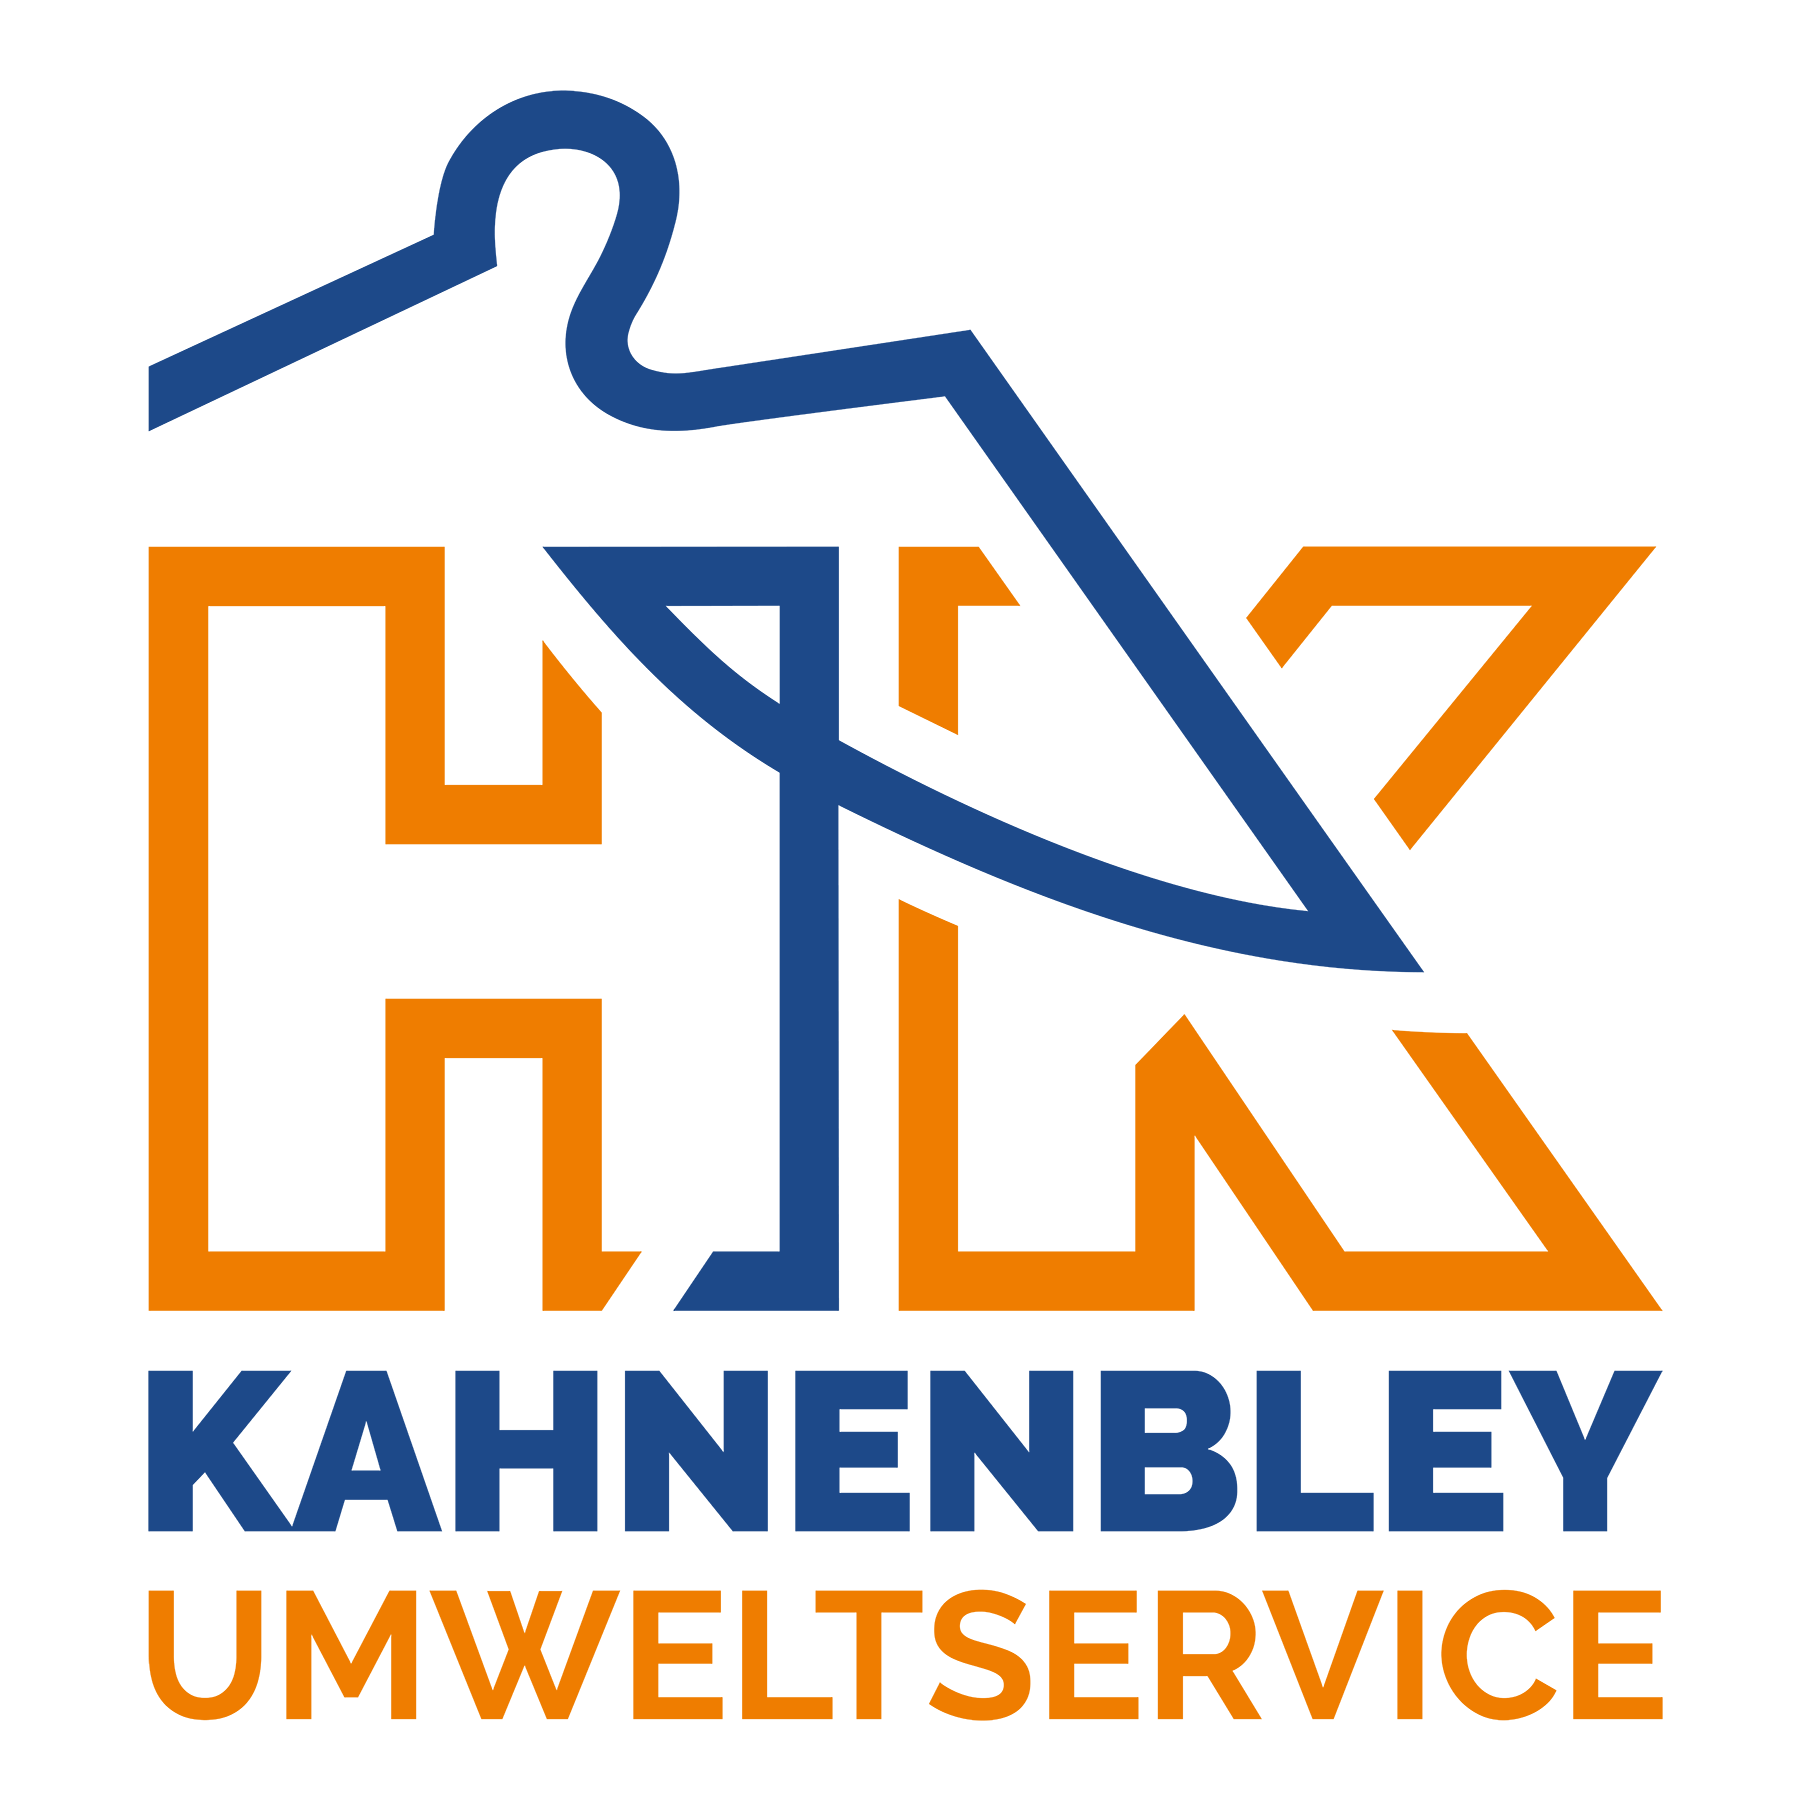 Hermann Kahnenbley GmbH & Co. KG